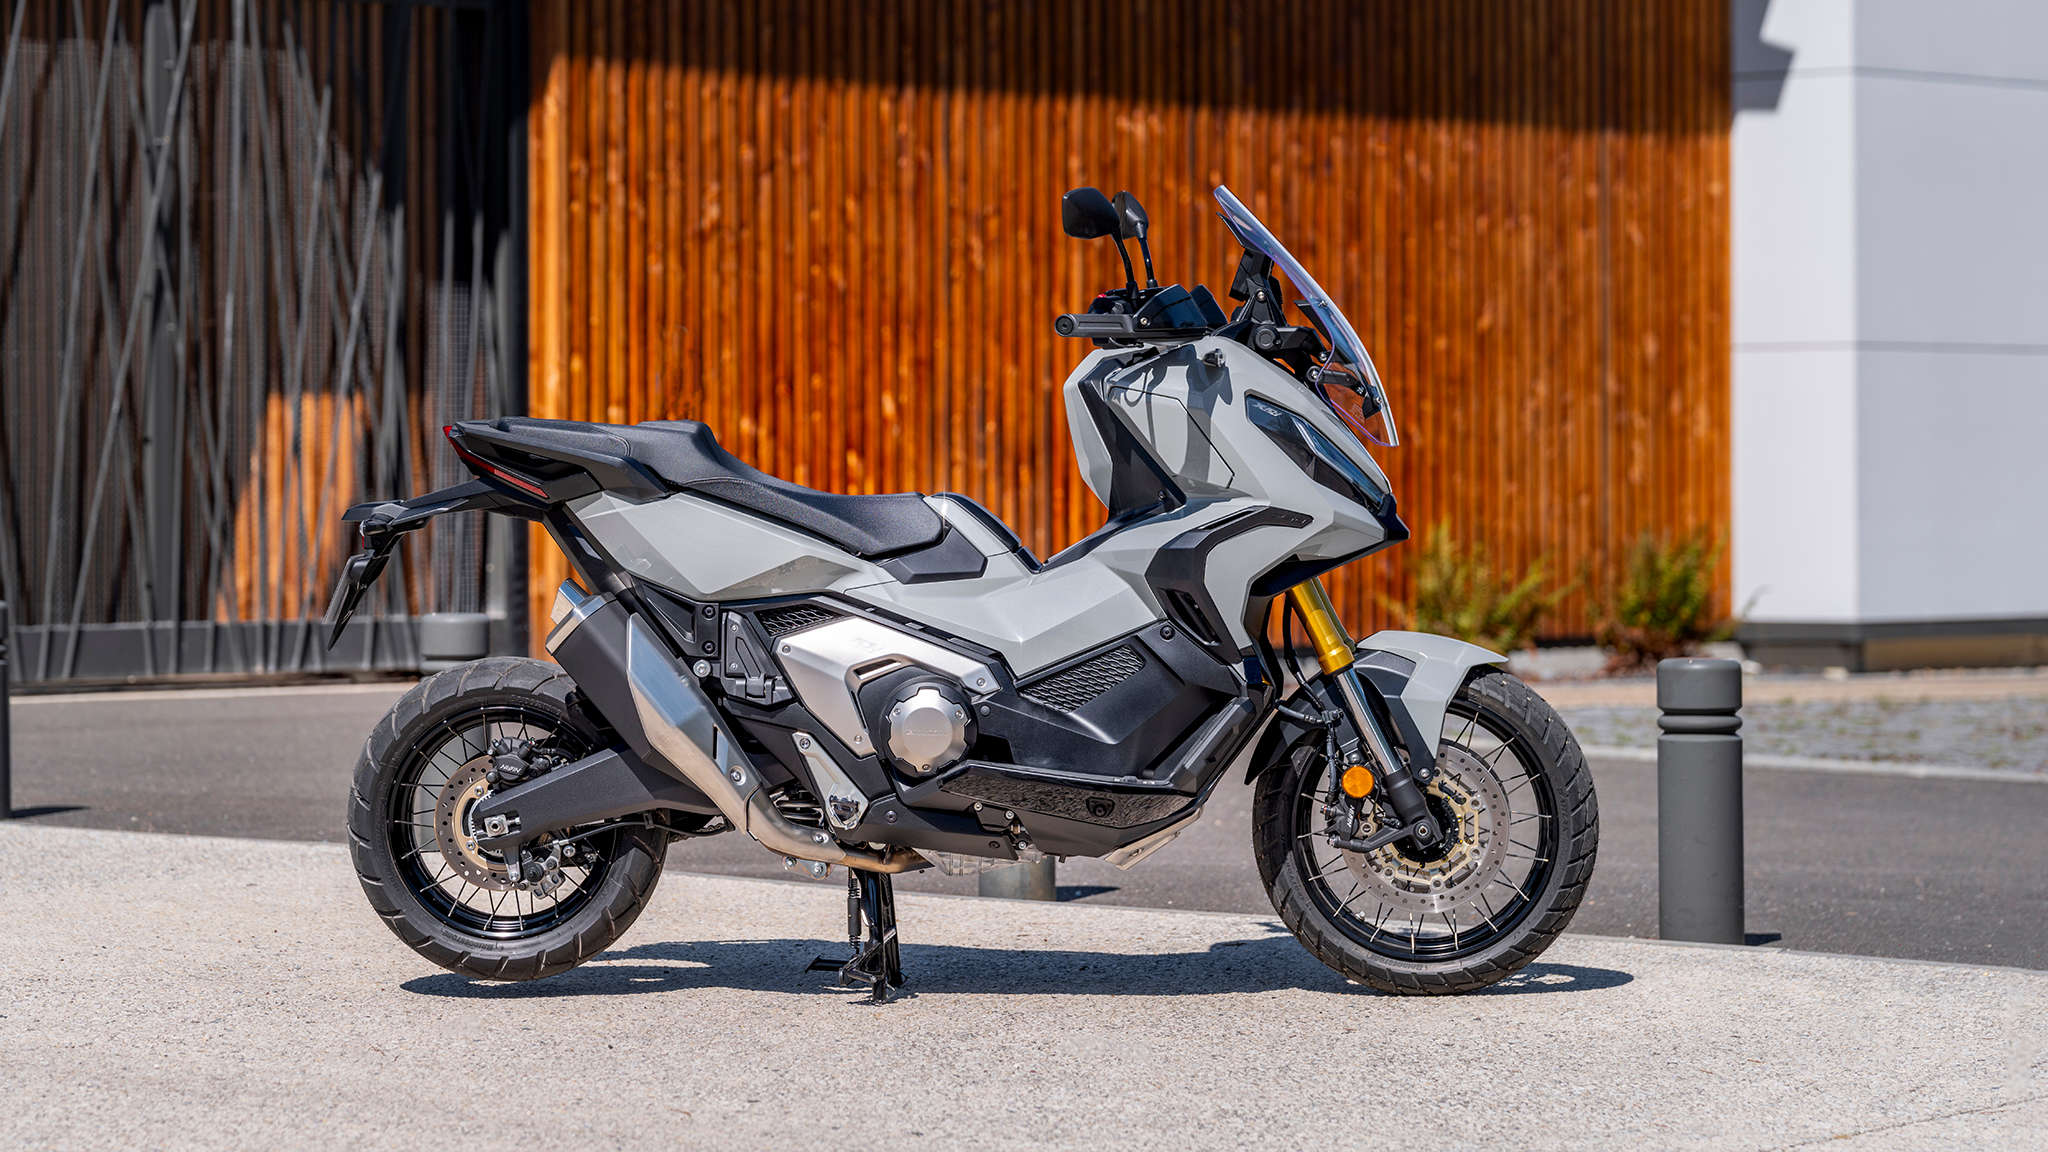 Honda X-ADV, šedý motocykl na ulici